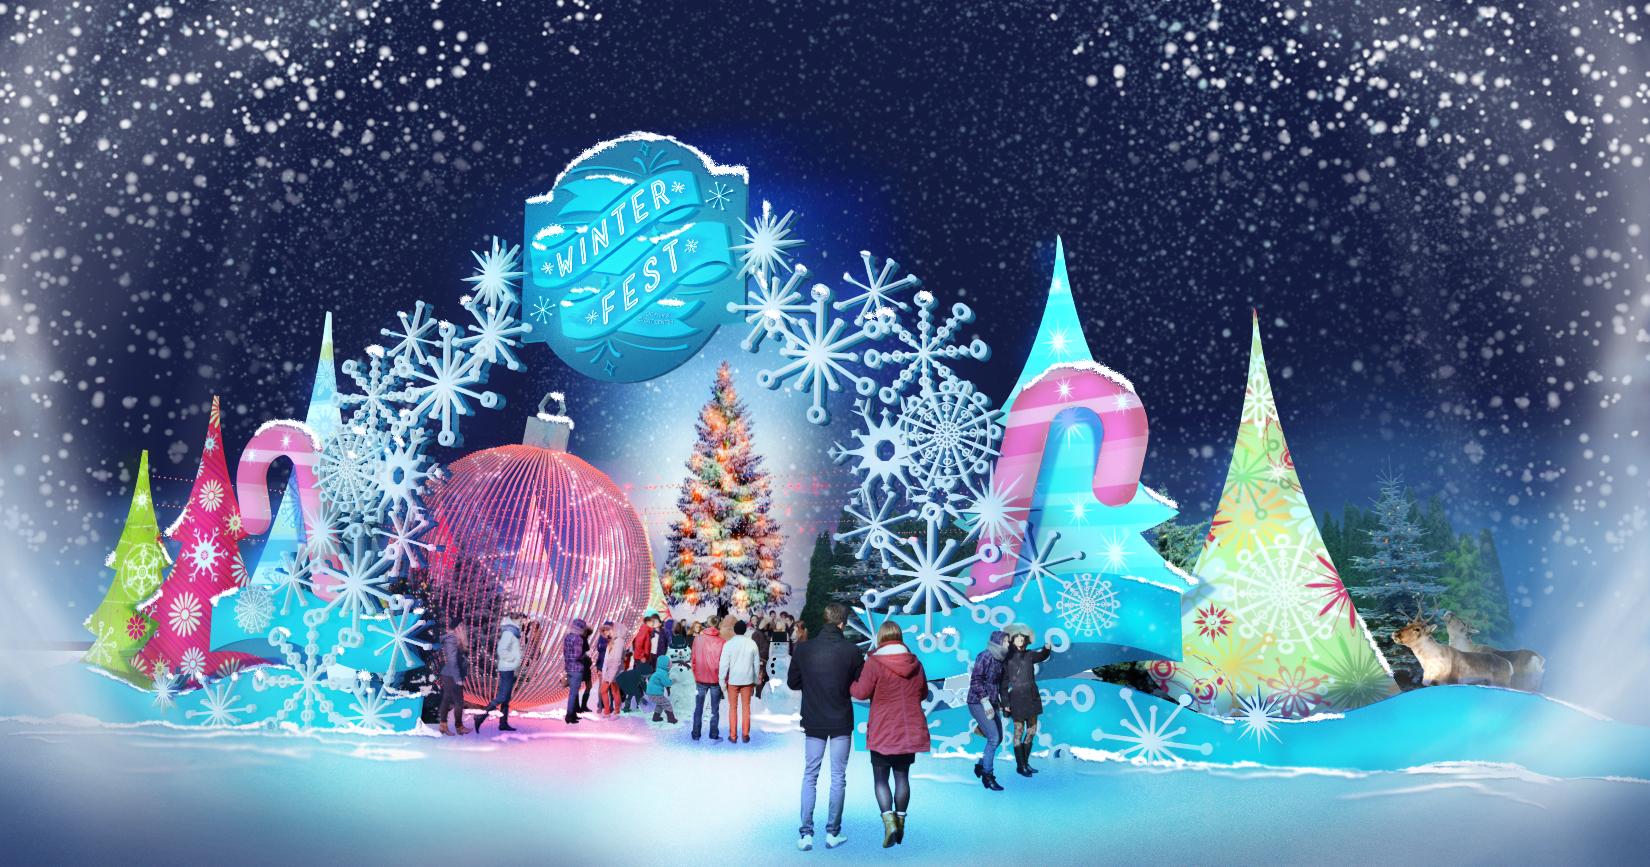 Winter Fest Entrance Image - 10.29.15